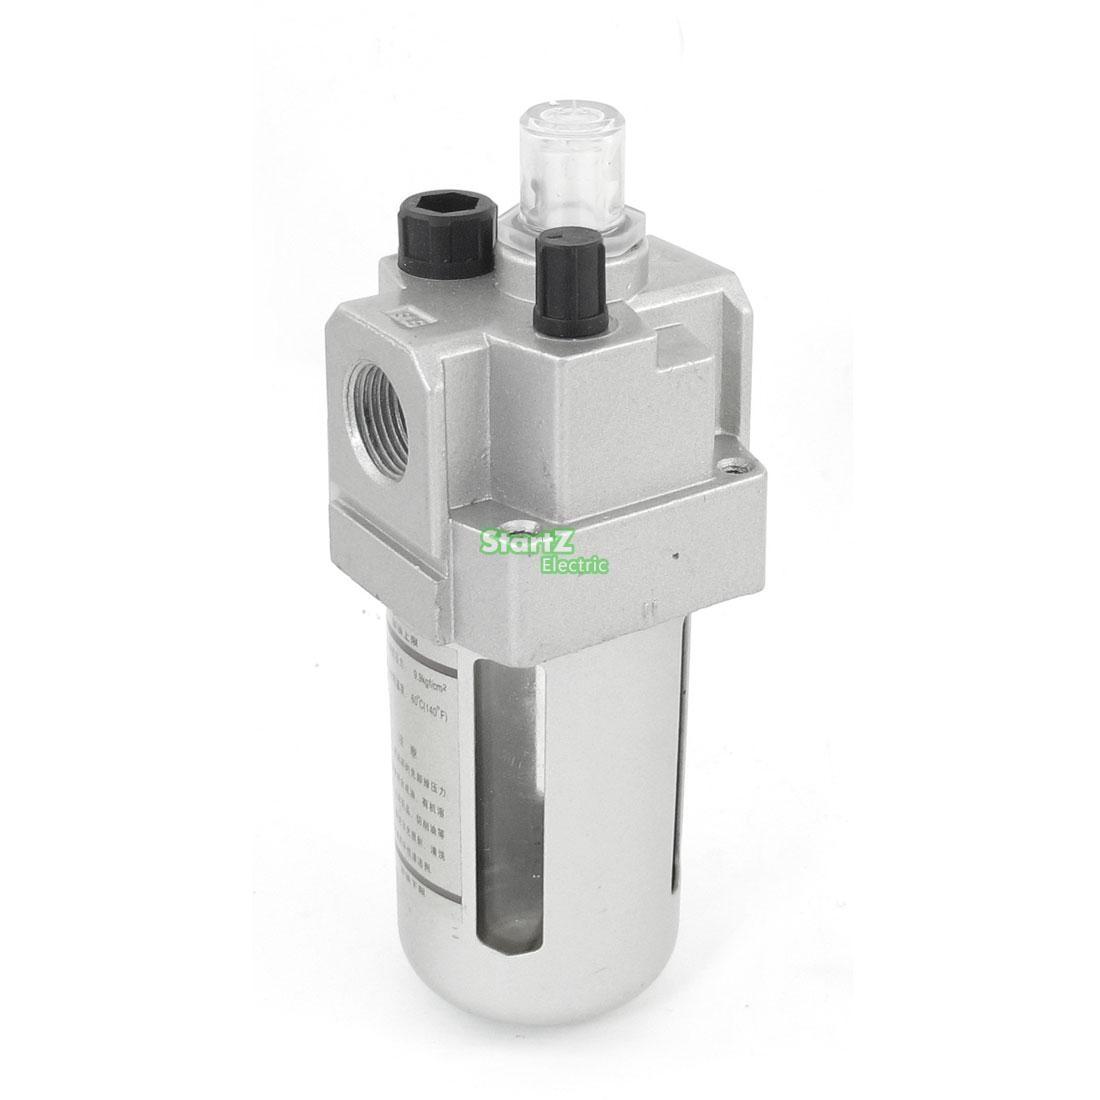 AL5000-10 G1''  Air Oiler Pneumatic Oil Fog Lubricator Press ryad mogador al madina ex lti al madina palace 4 агадир